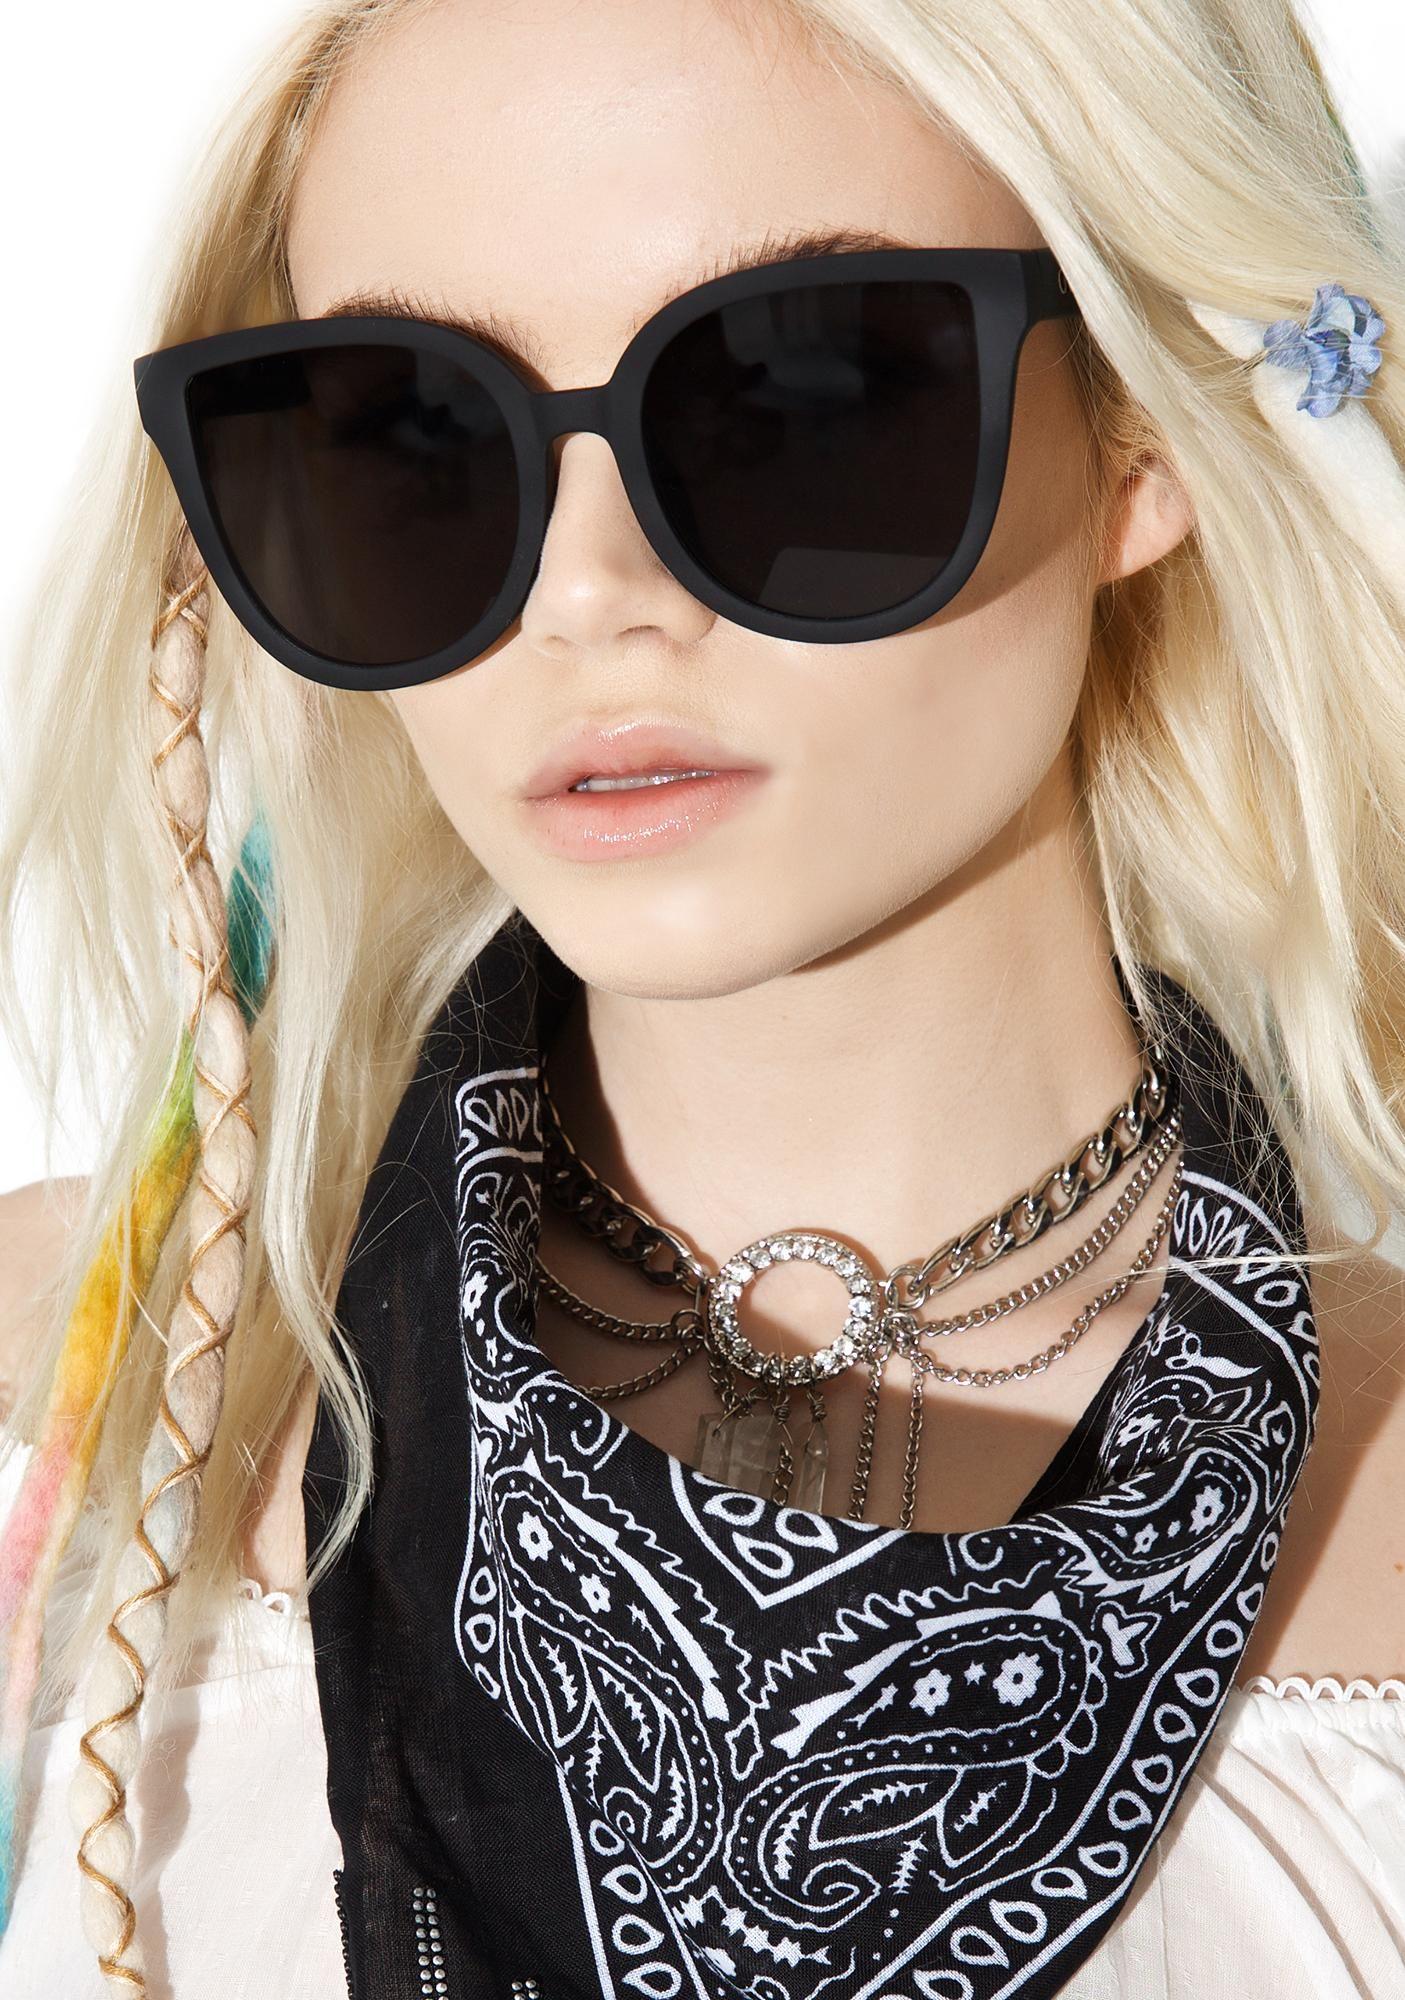 9da366a5e72 Quay Eyeware Black Paradiso Sunglasses will have you flirtin  with tha  tropic heat